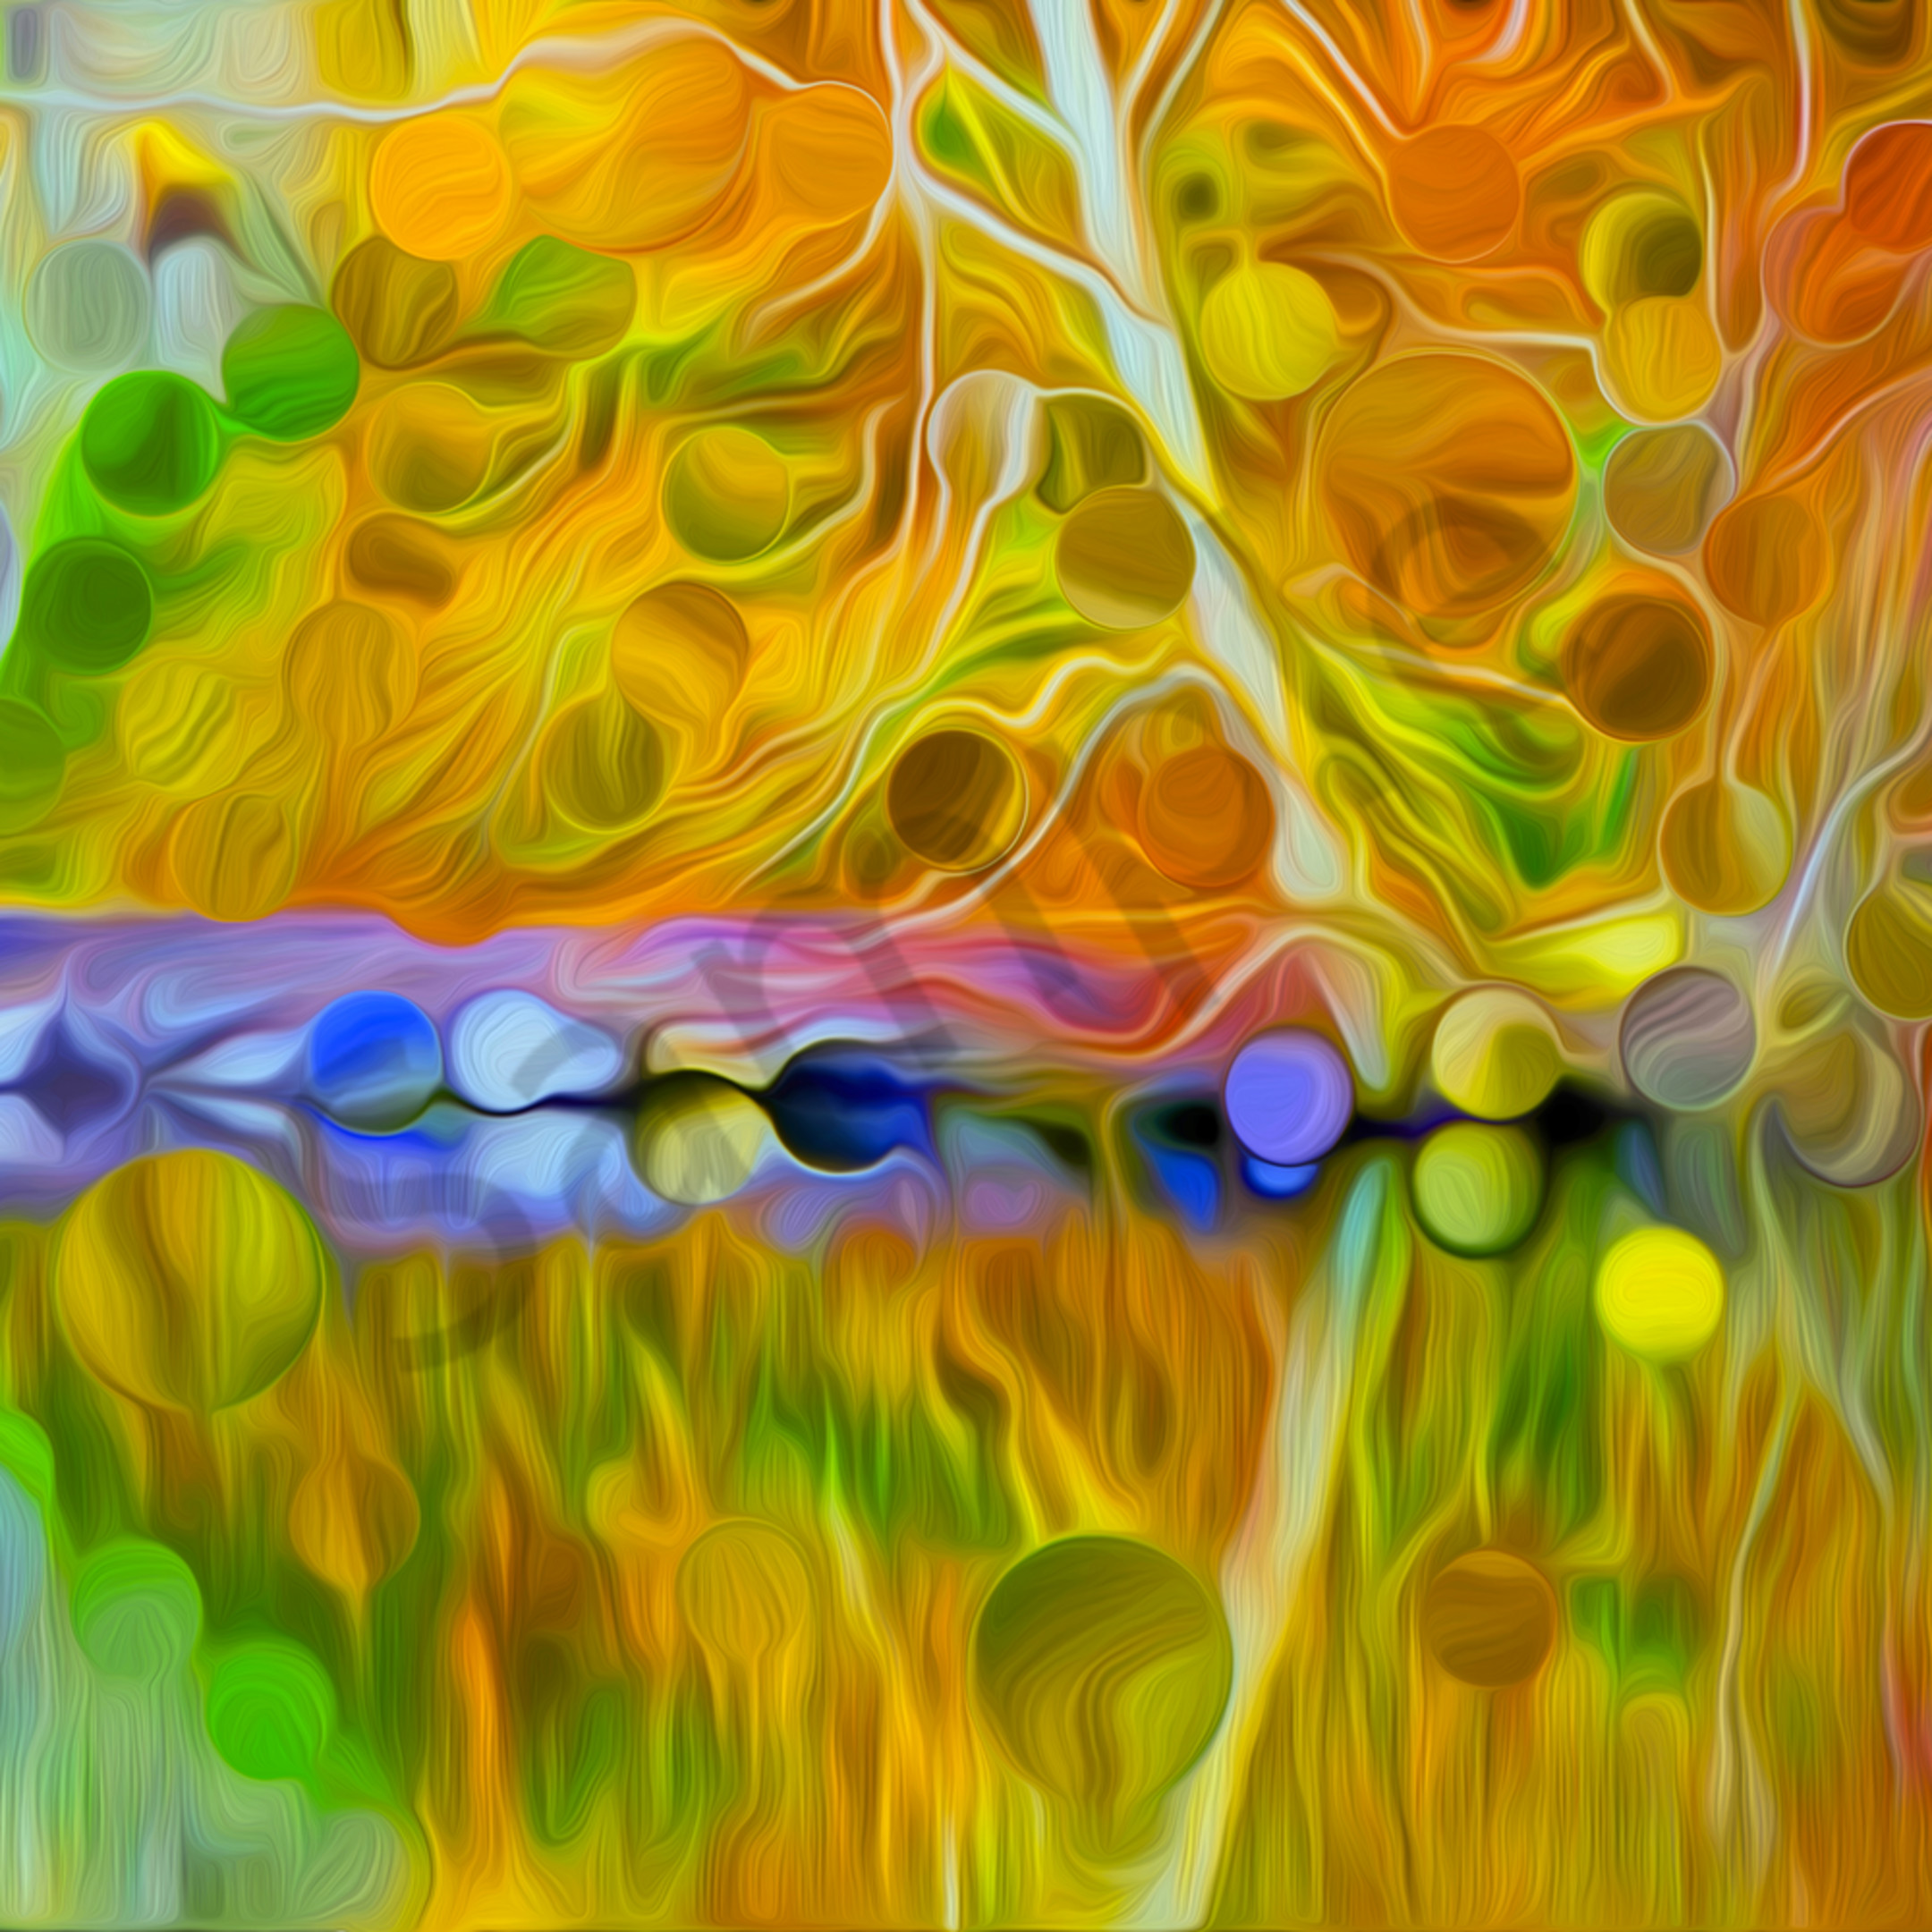 30 by 40 1 bubblegum trees 50 by 35 thetis more lines bubbles rxreqb